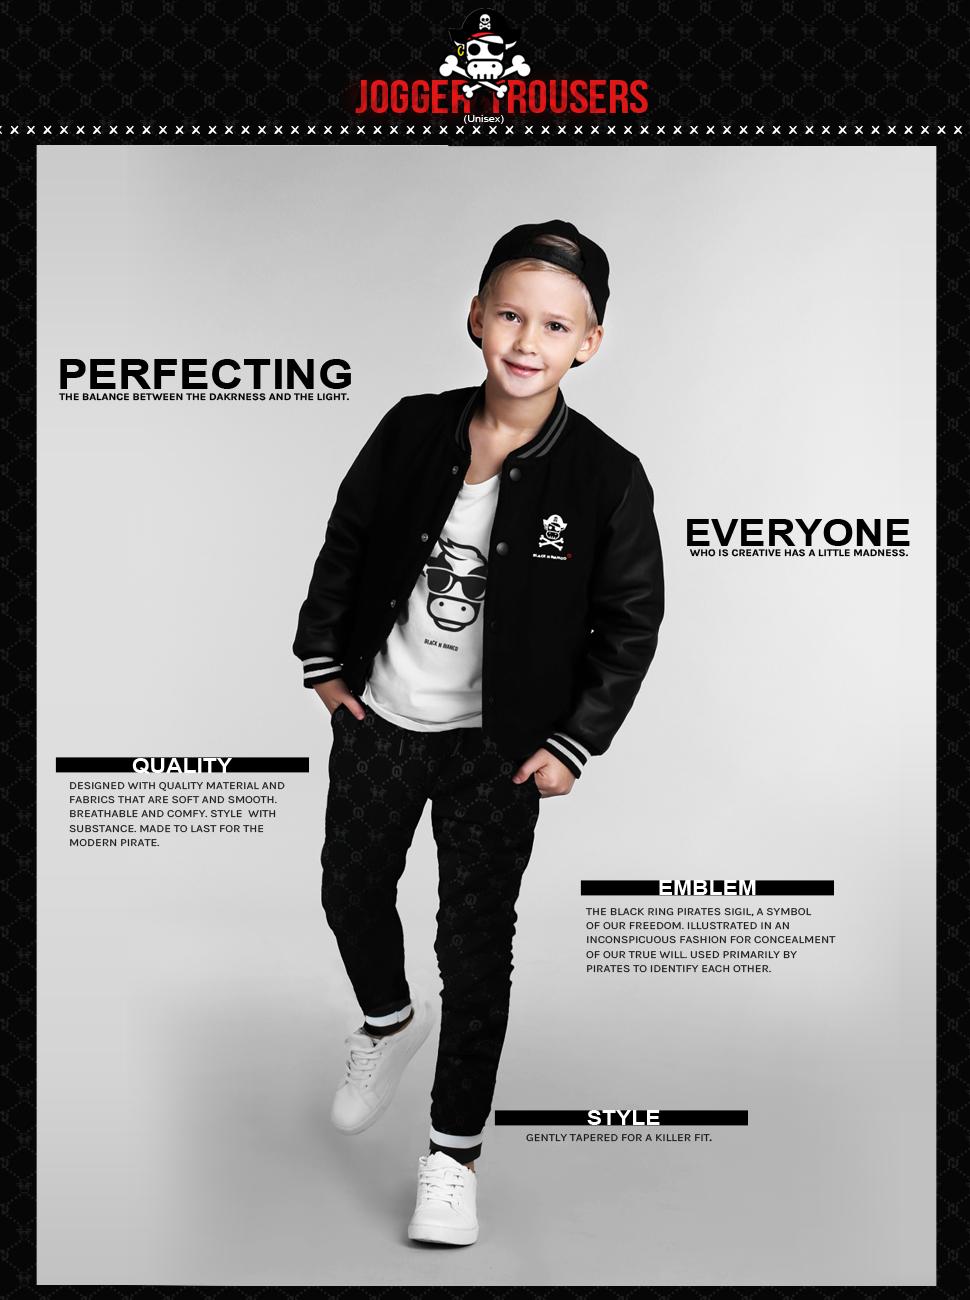 Black n Bianco Sweatpants Joggers Streetwear Skate Fashion